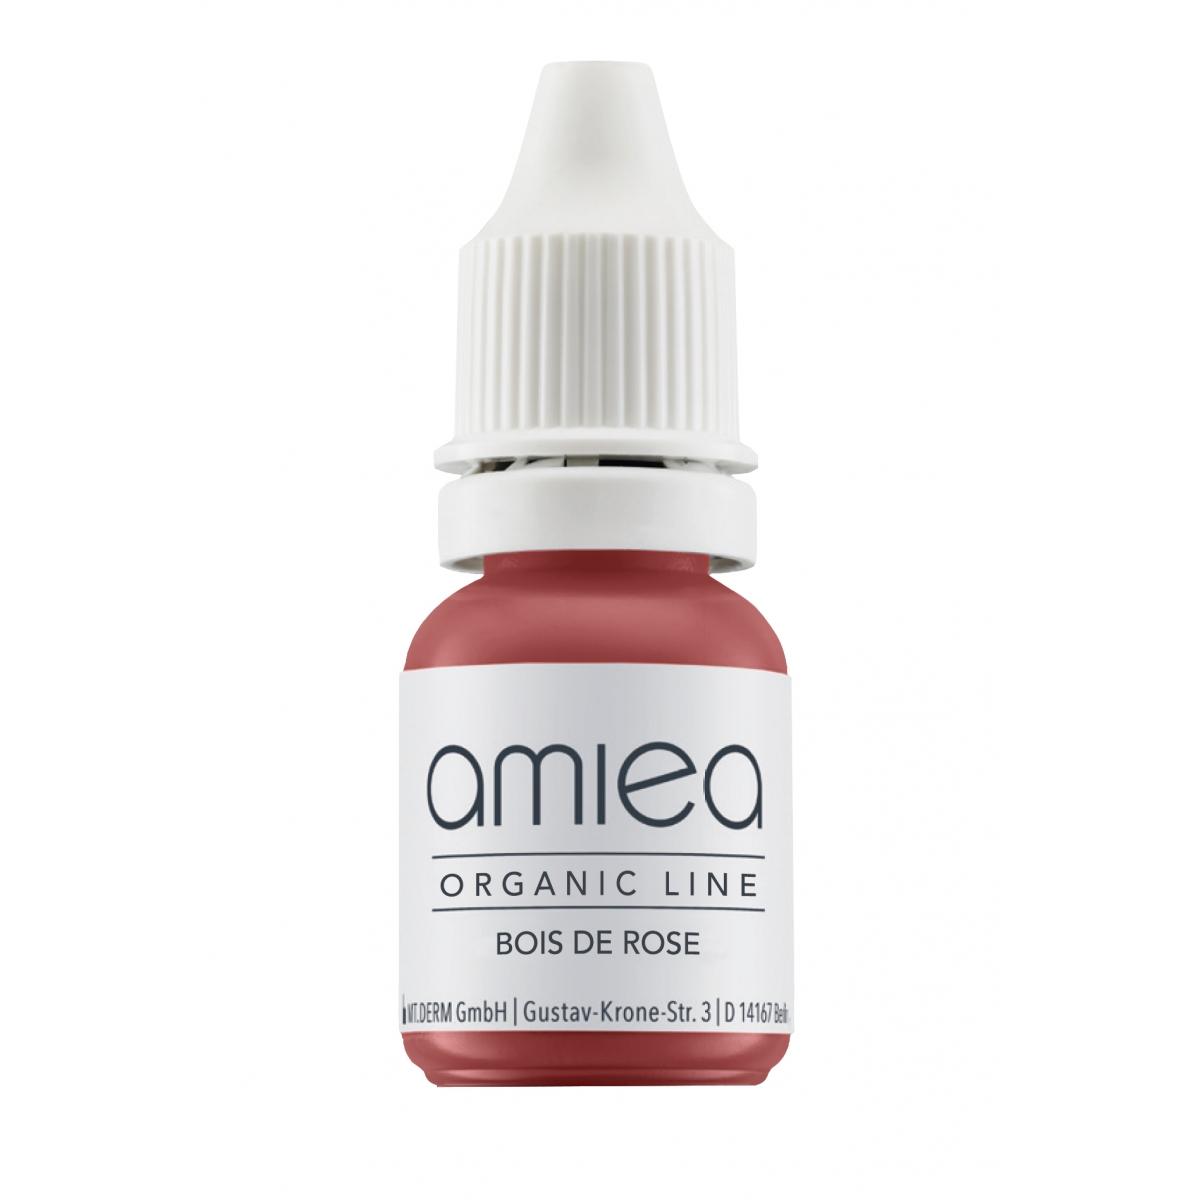 Organicline (5 ml)  - PIGMENTS AMIEA ORGANICLINE BOIS DE ROSE, Flacon 5 ml